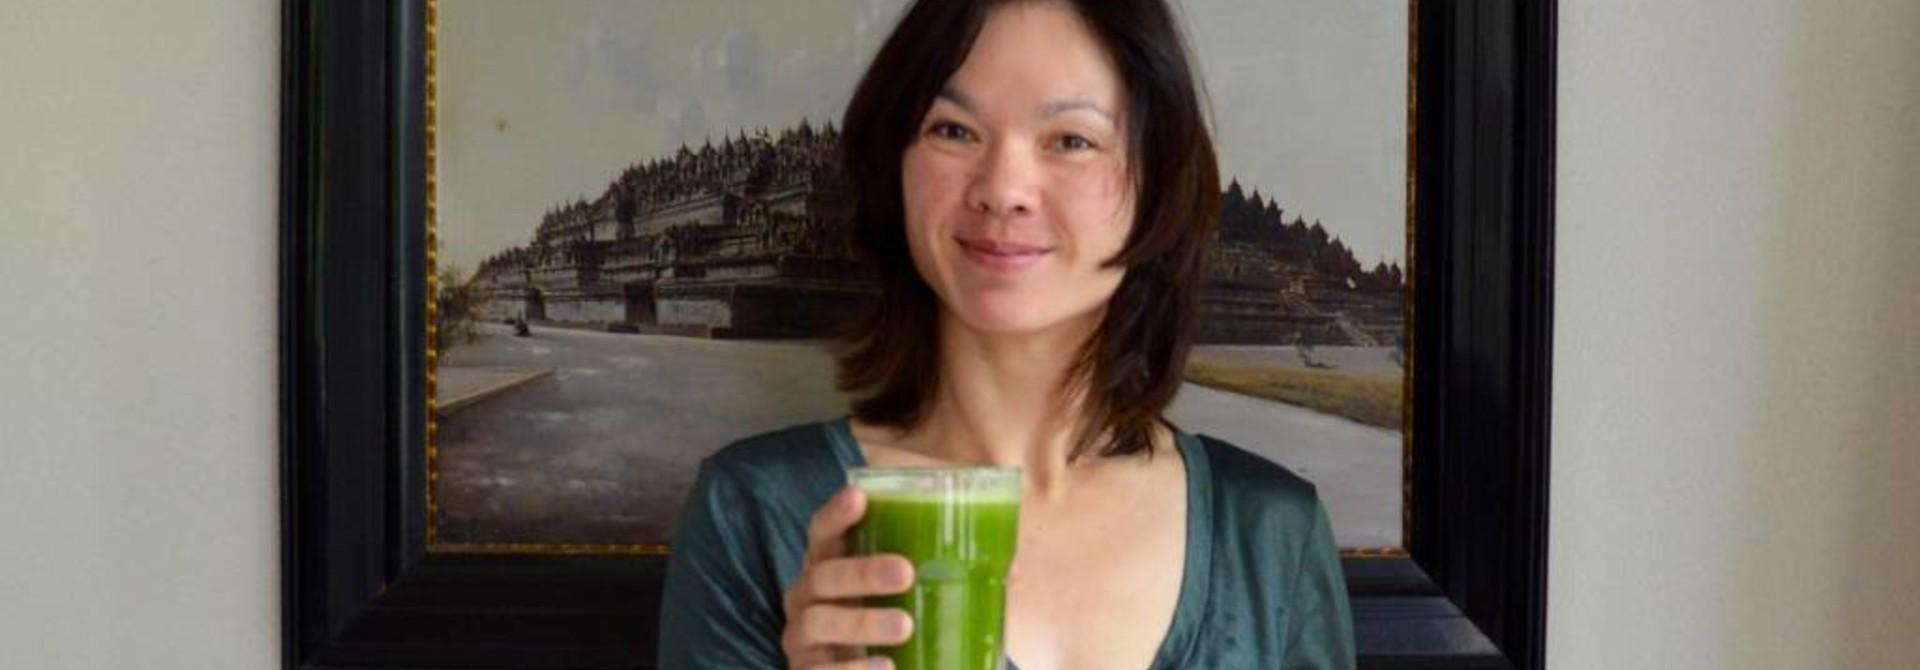 Groen detox sap met matcha, selder, komkommer, citroen en gember